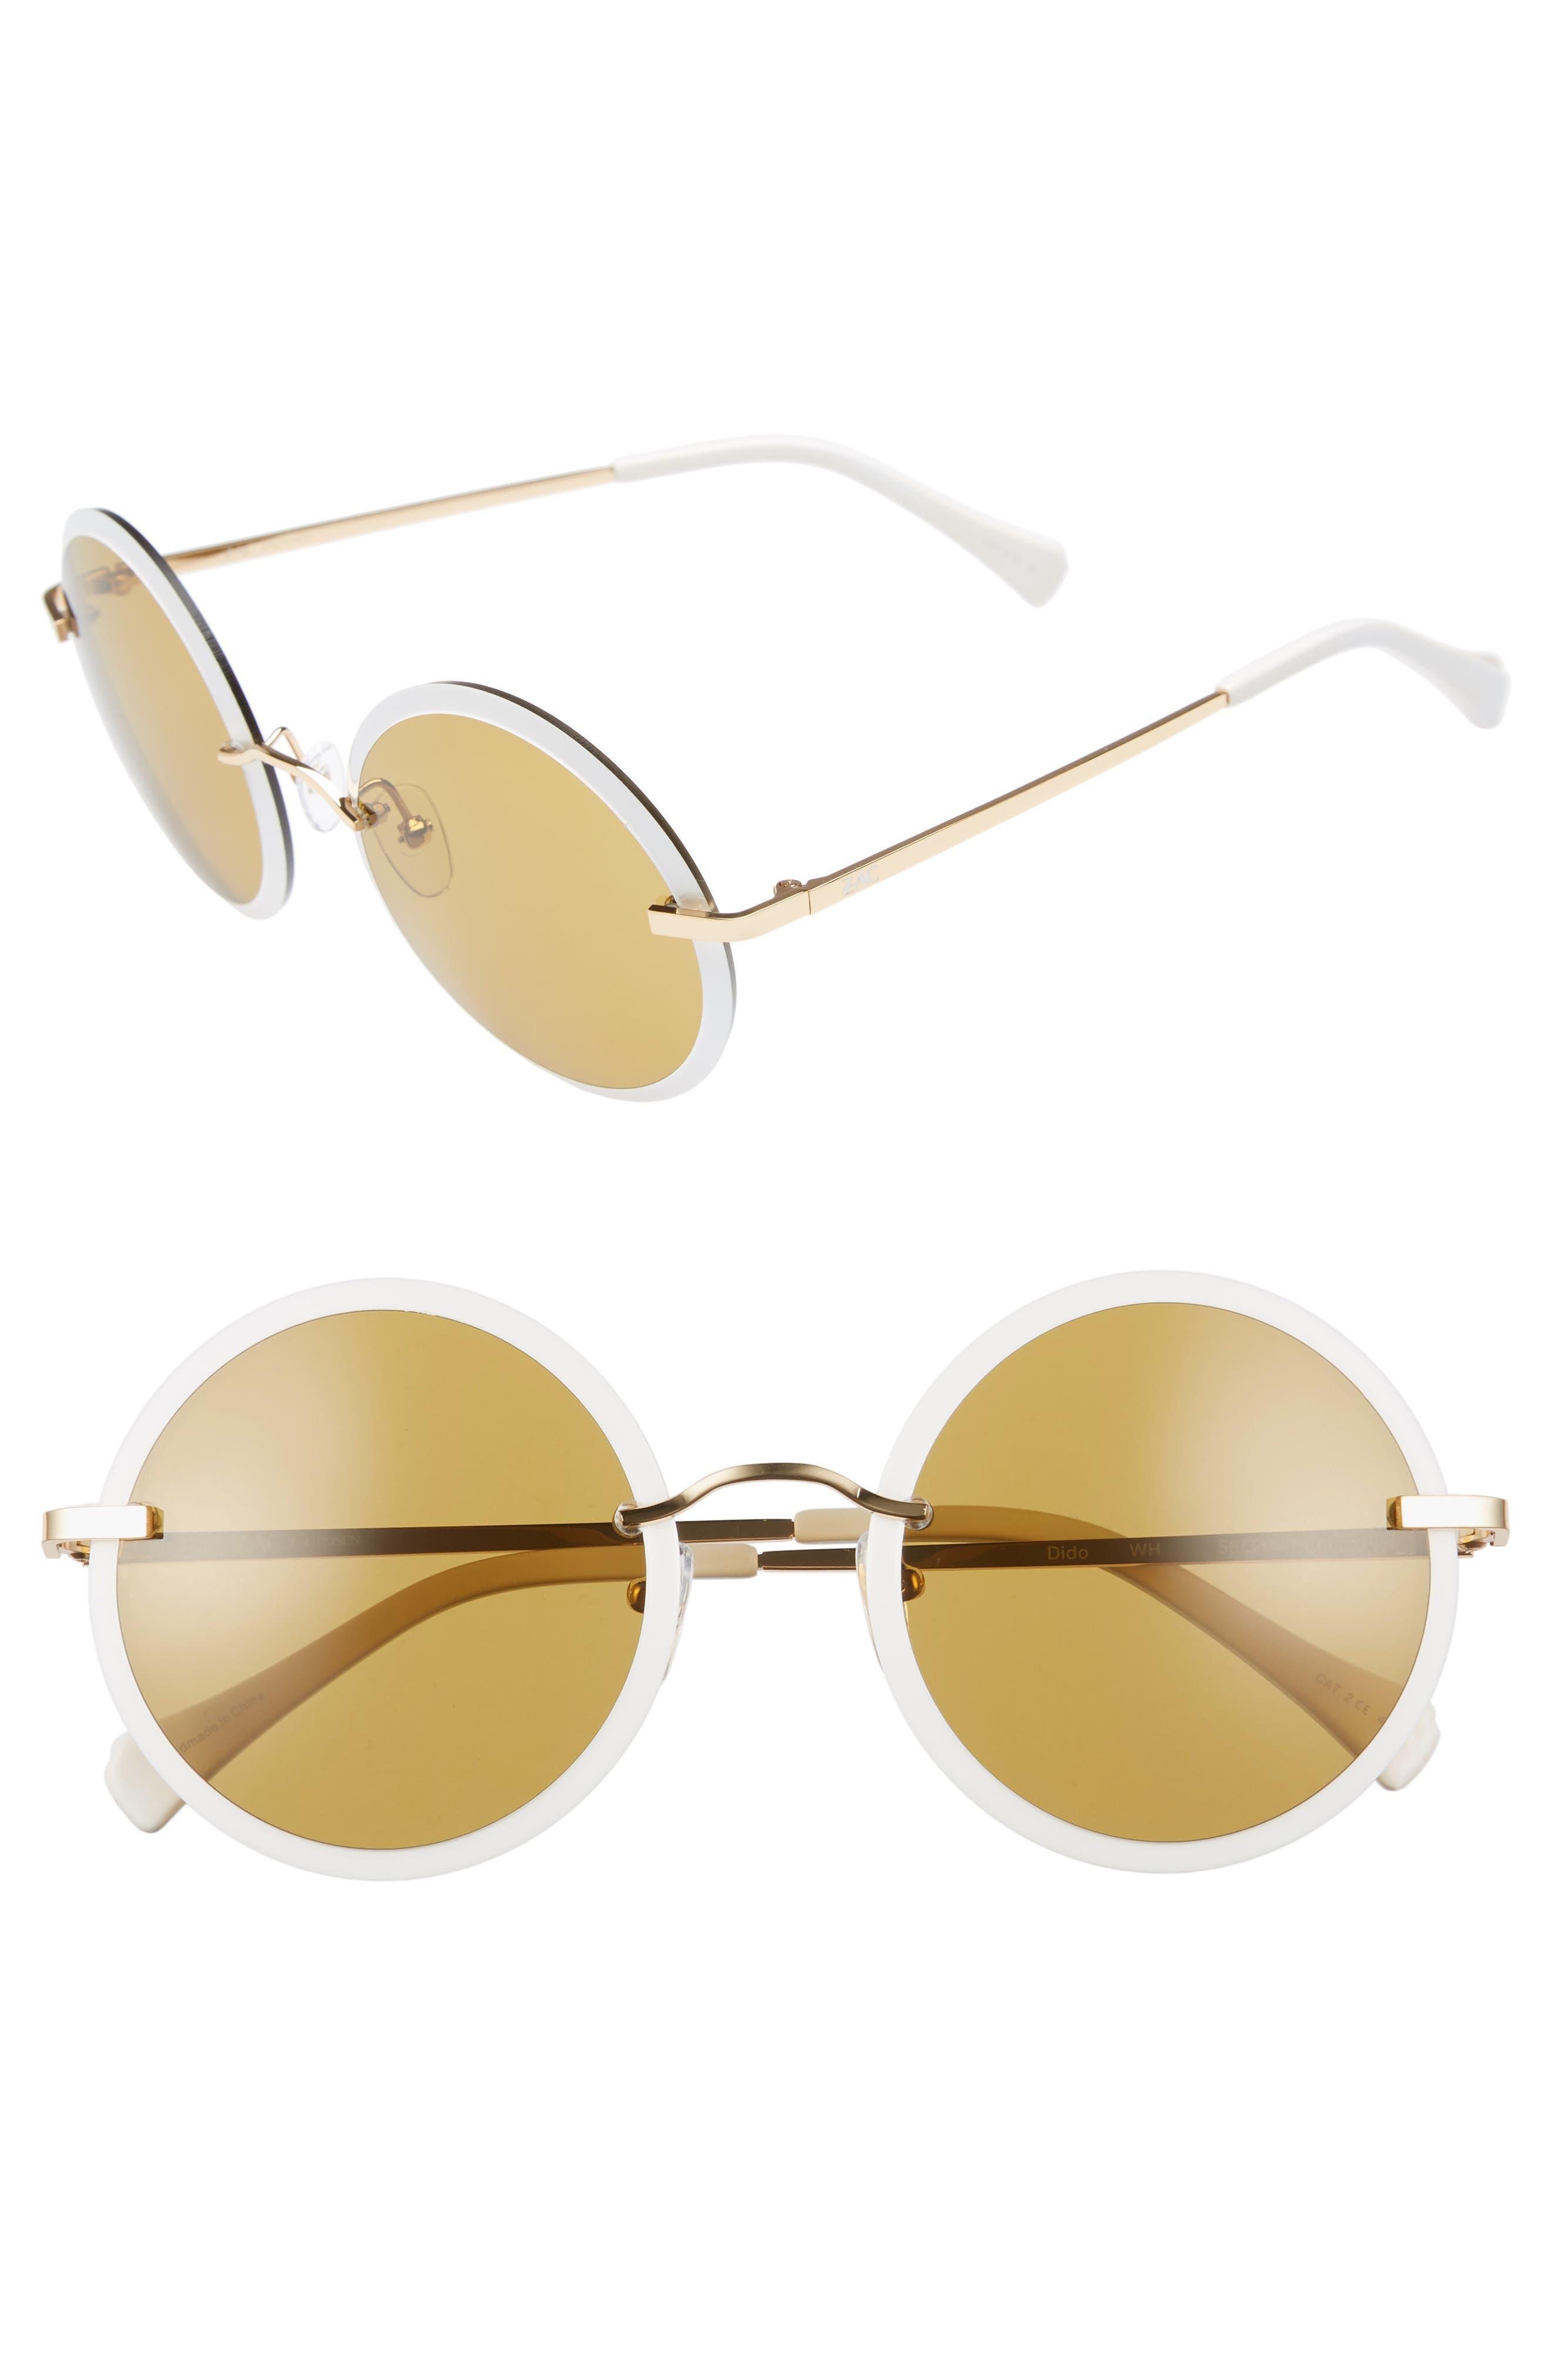 ZAC Zac Posen Dido 58mm Sunglasses